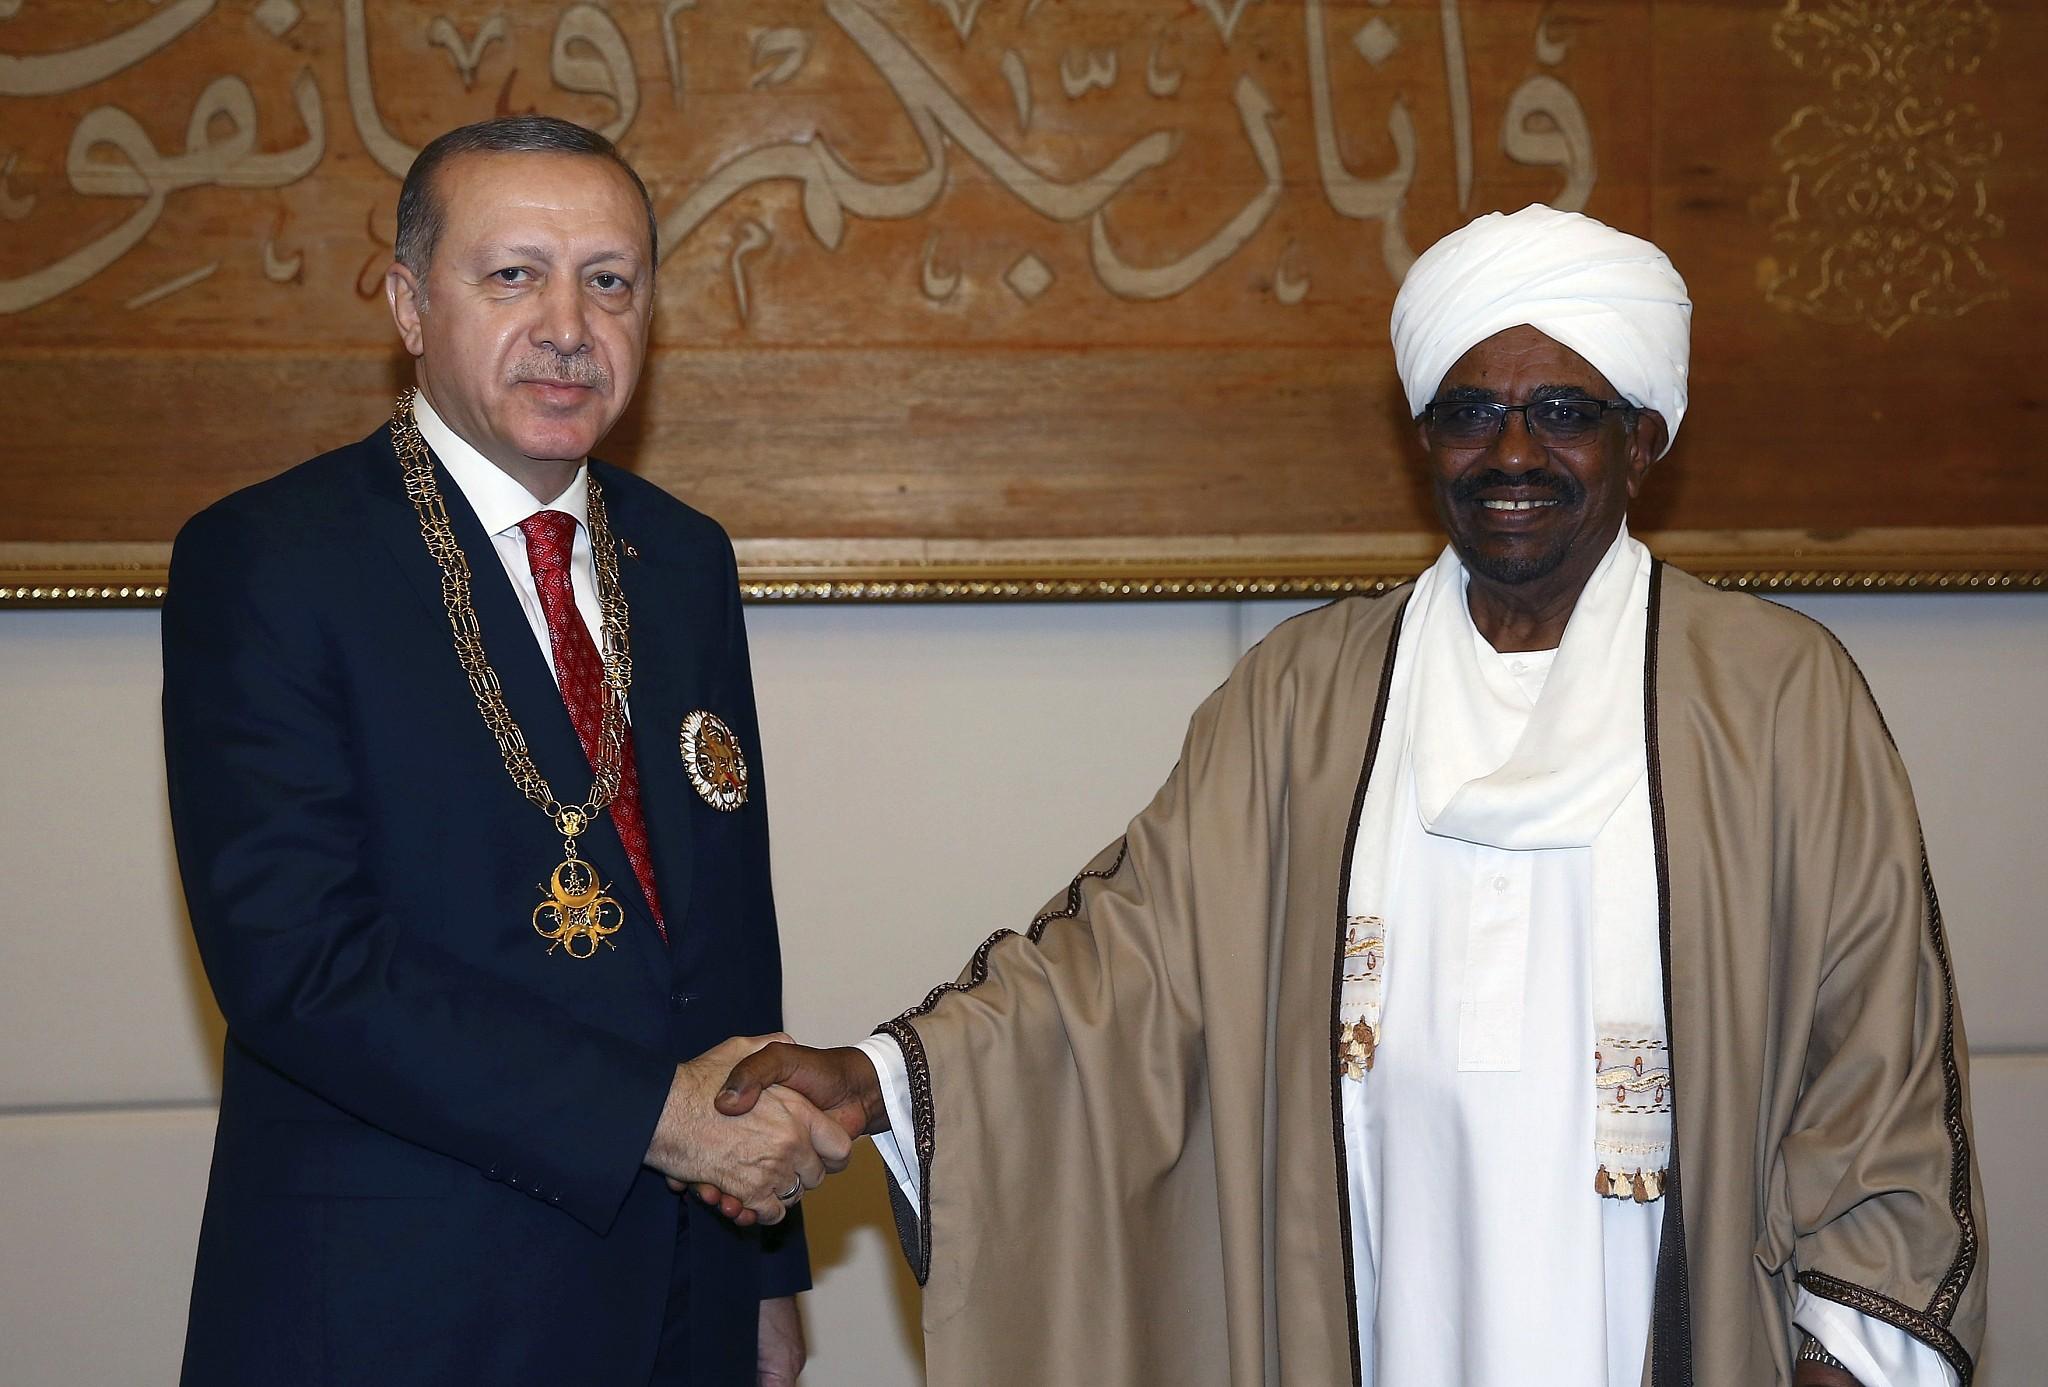 Turkish President Laughs Off Demand To Arrest Sudan Leader The